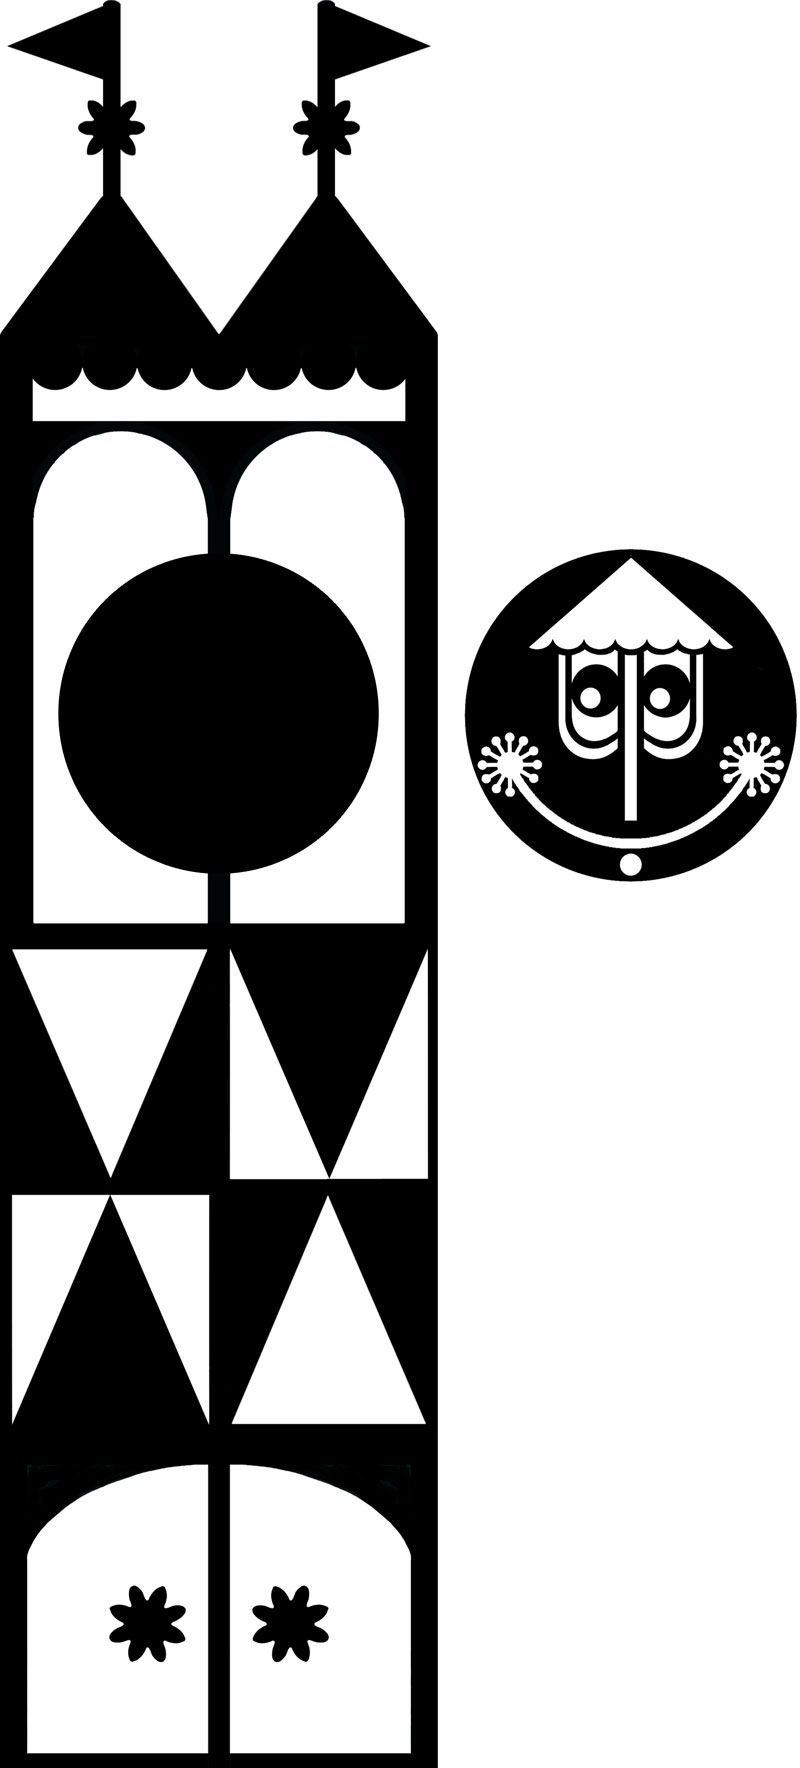 iasw_center_tower&face